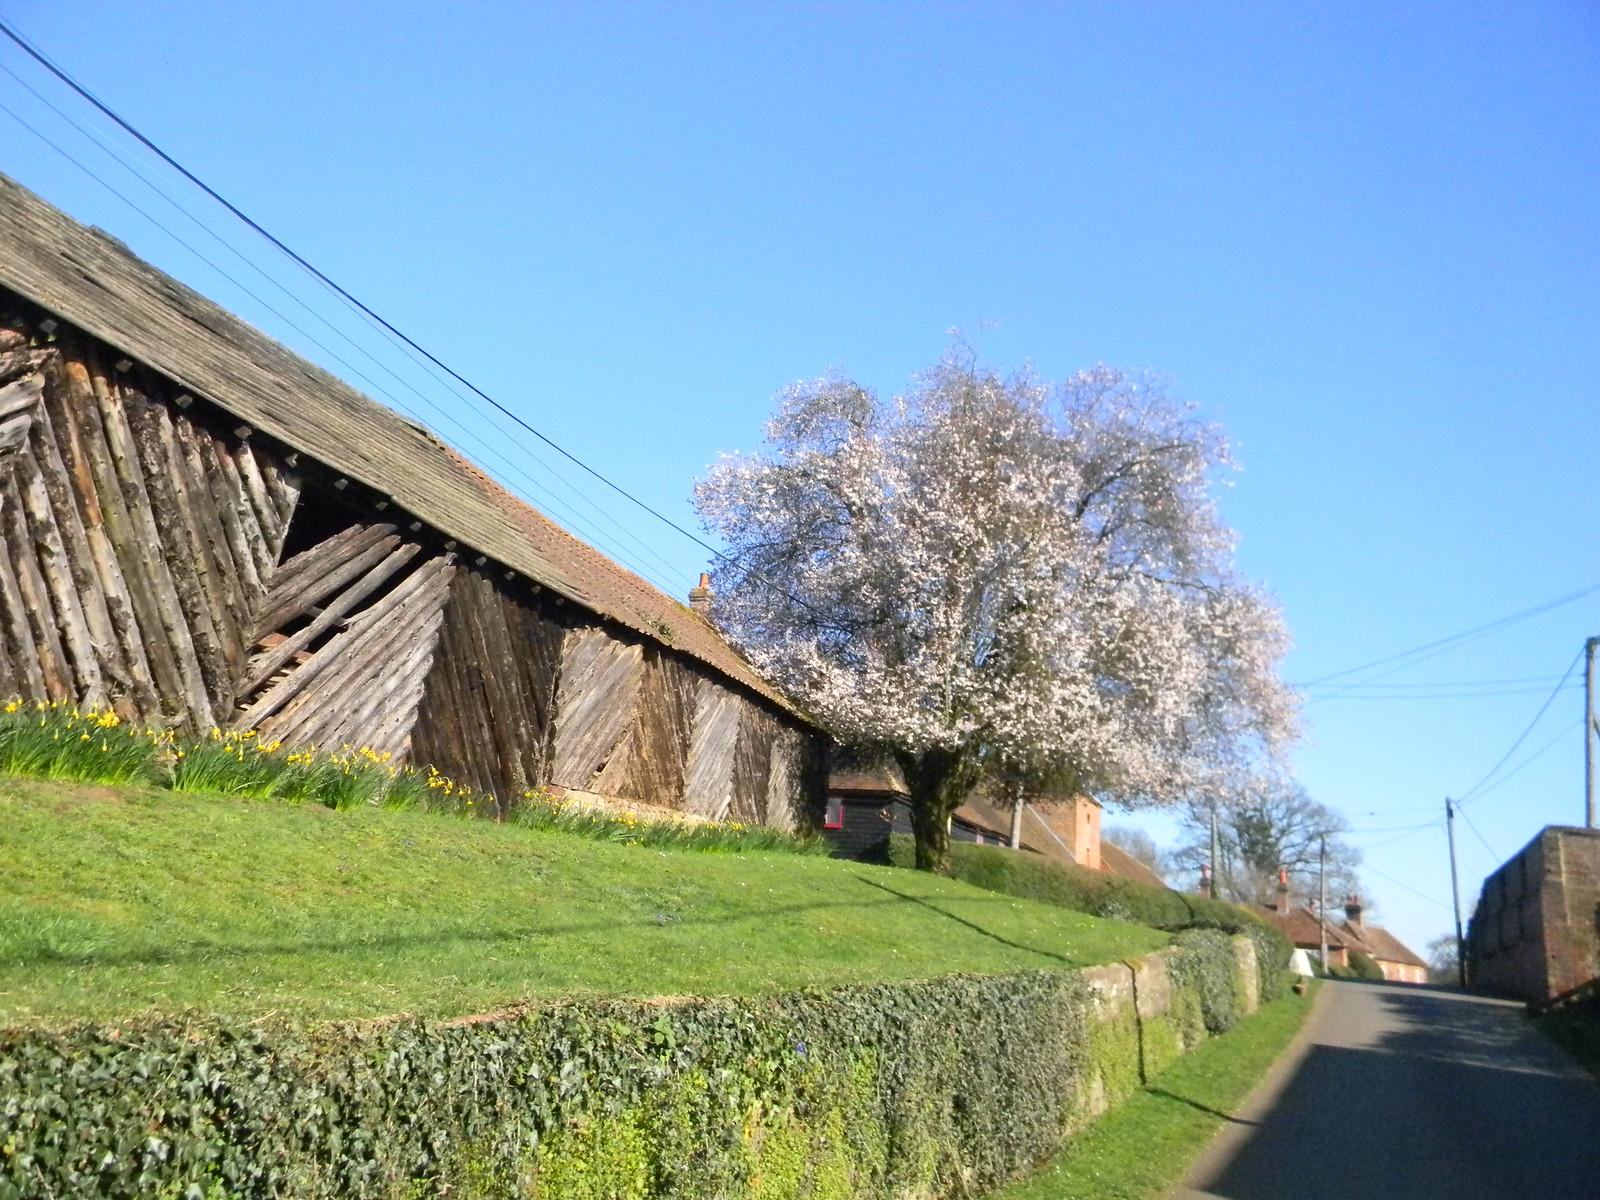 Flowering tree, unusual building Plum maybe? Flowers too big for blackthorn. Farnham to Godalming